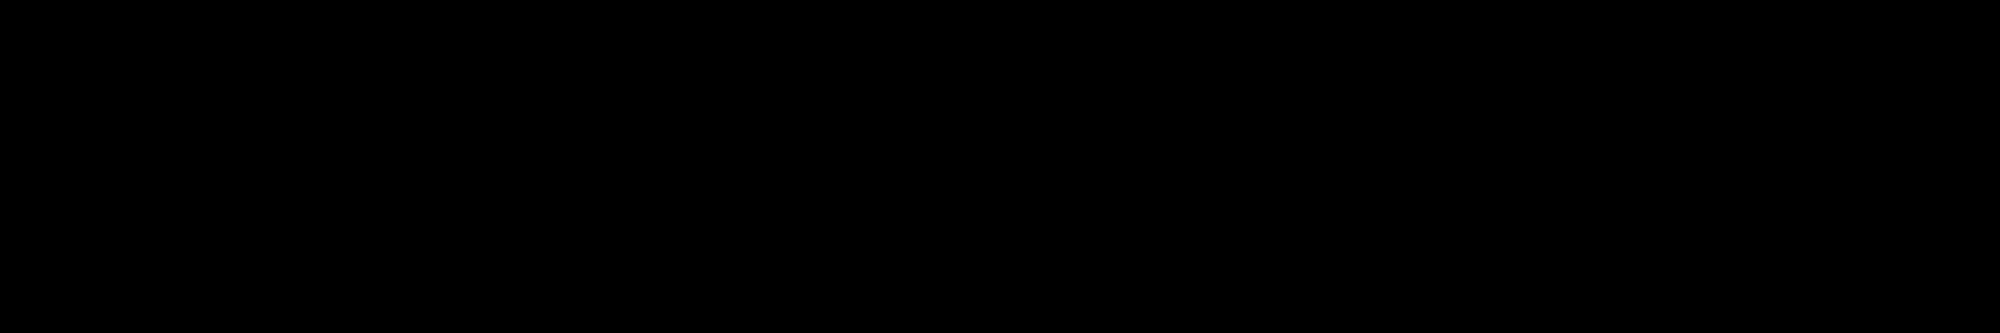 work-bench ventures logo png